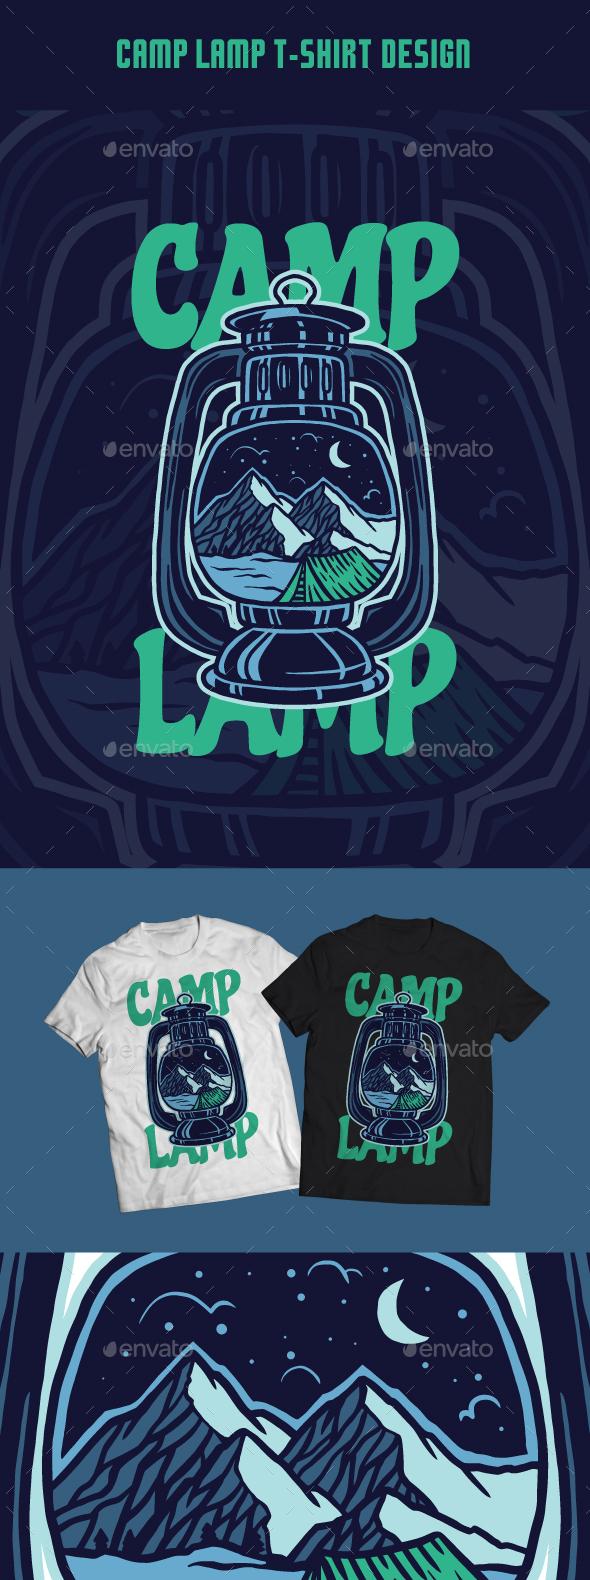 Camp Lamp T-Shirt Design